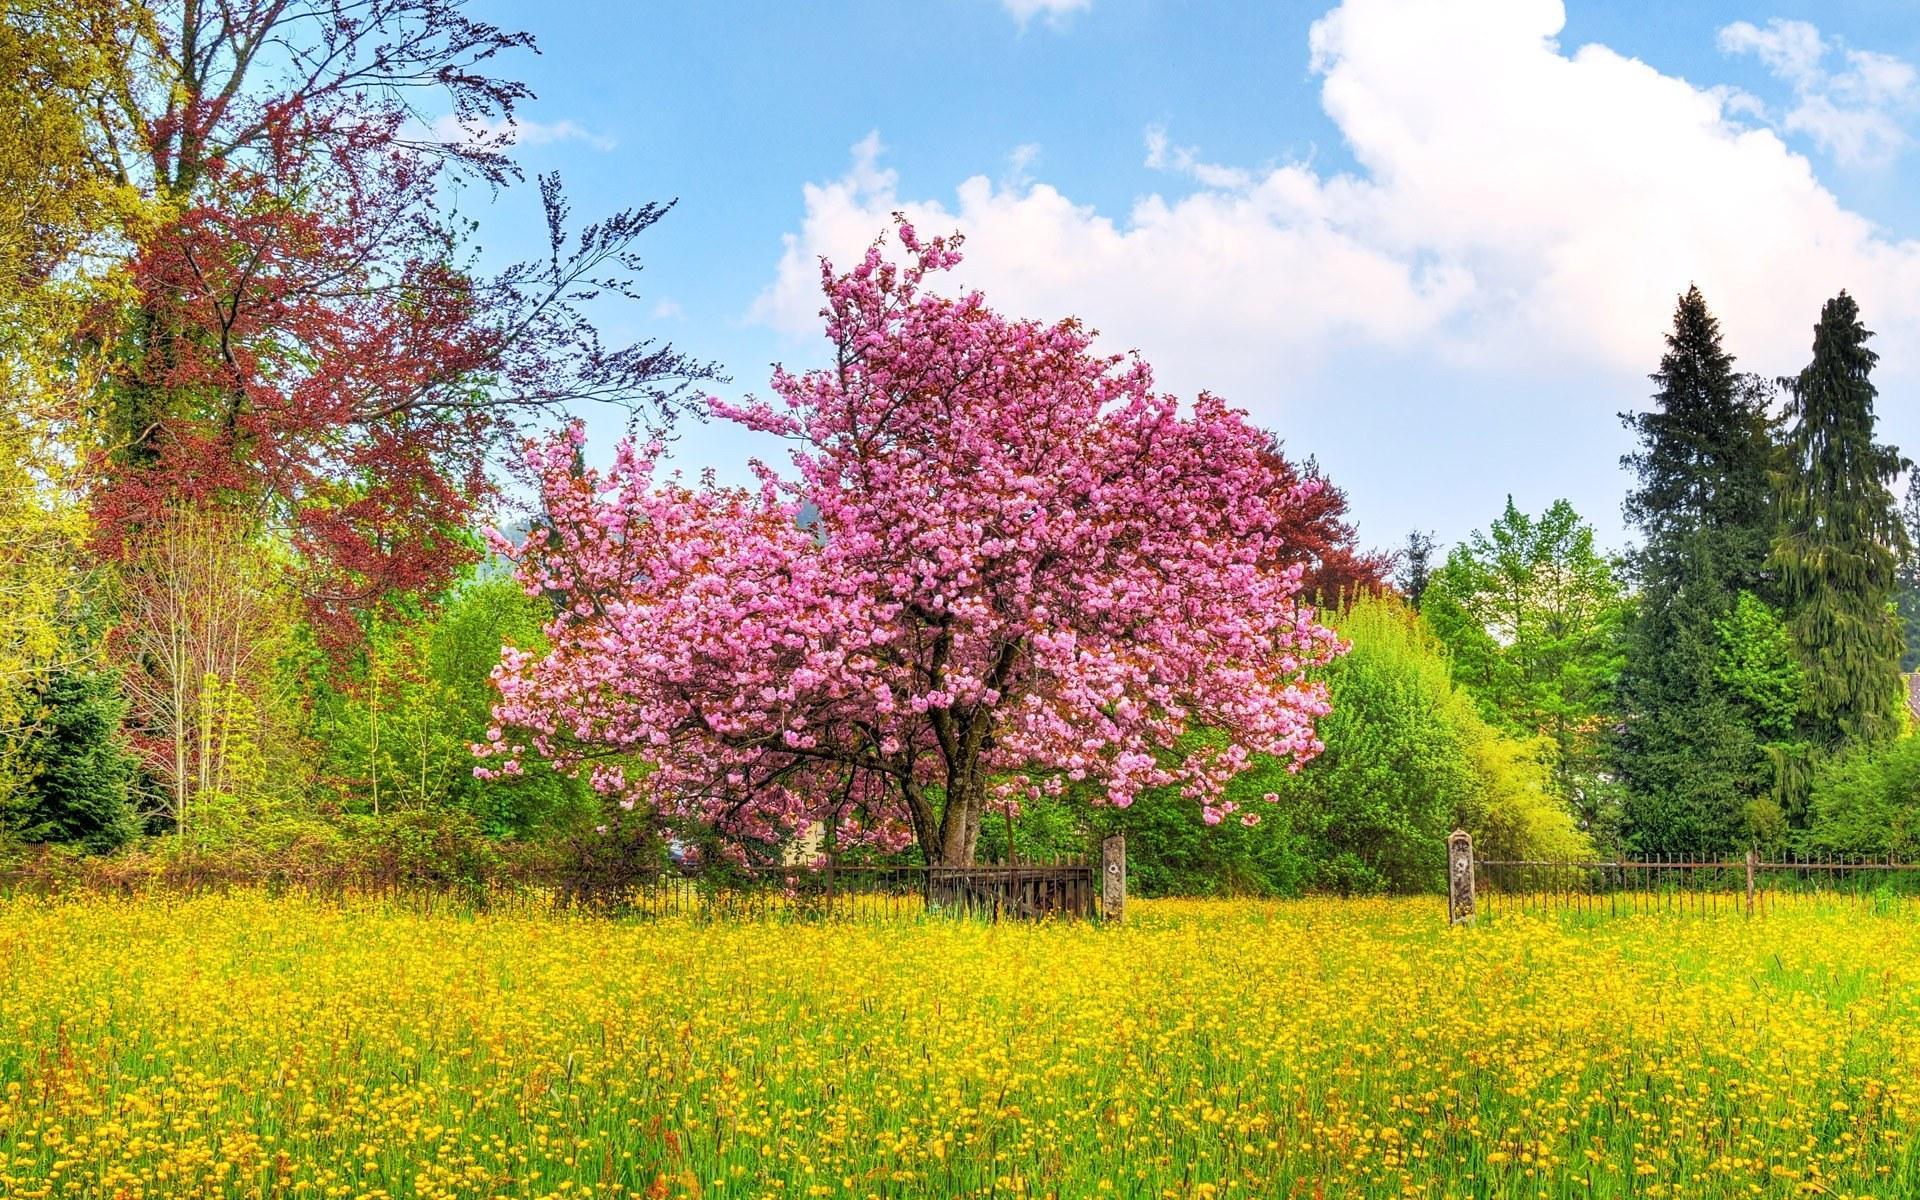 tree_cherry_tree_in_blossom_cherry_blossom_nature-5874.jpg